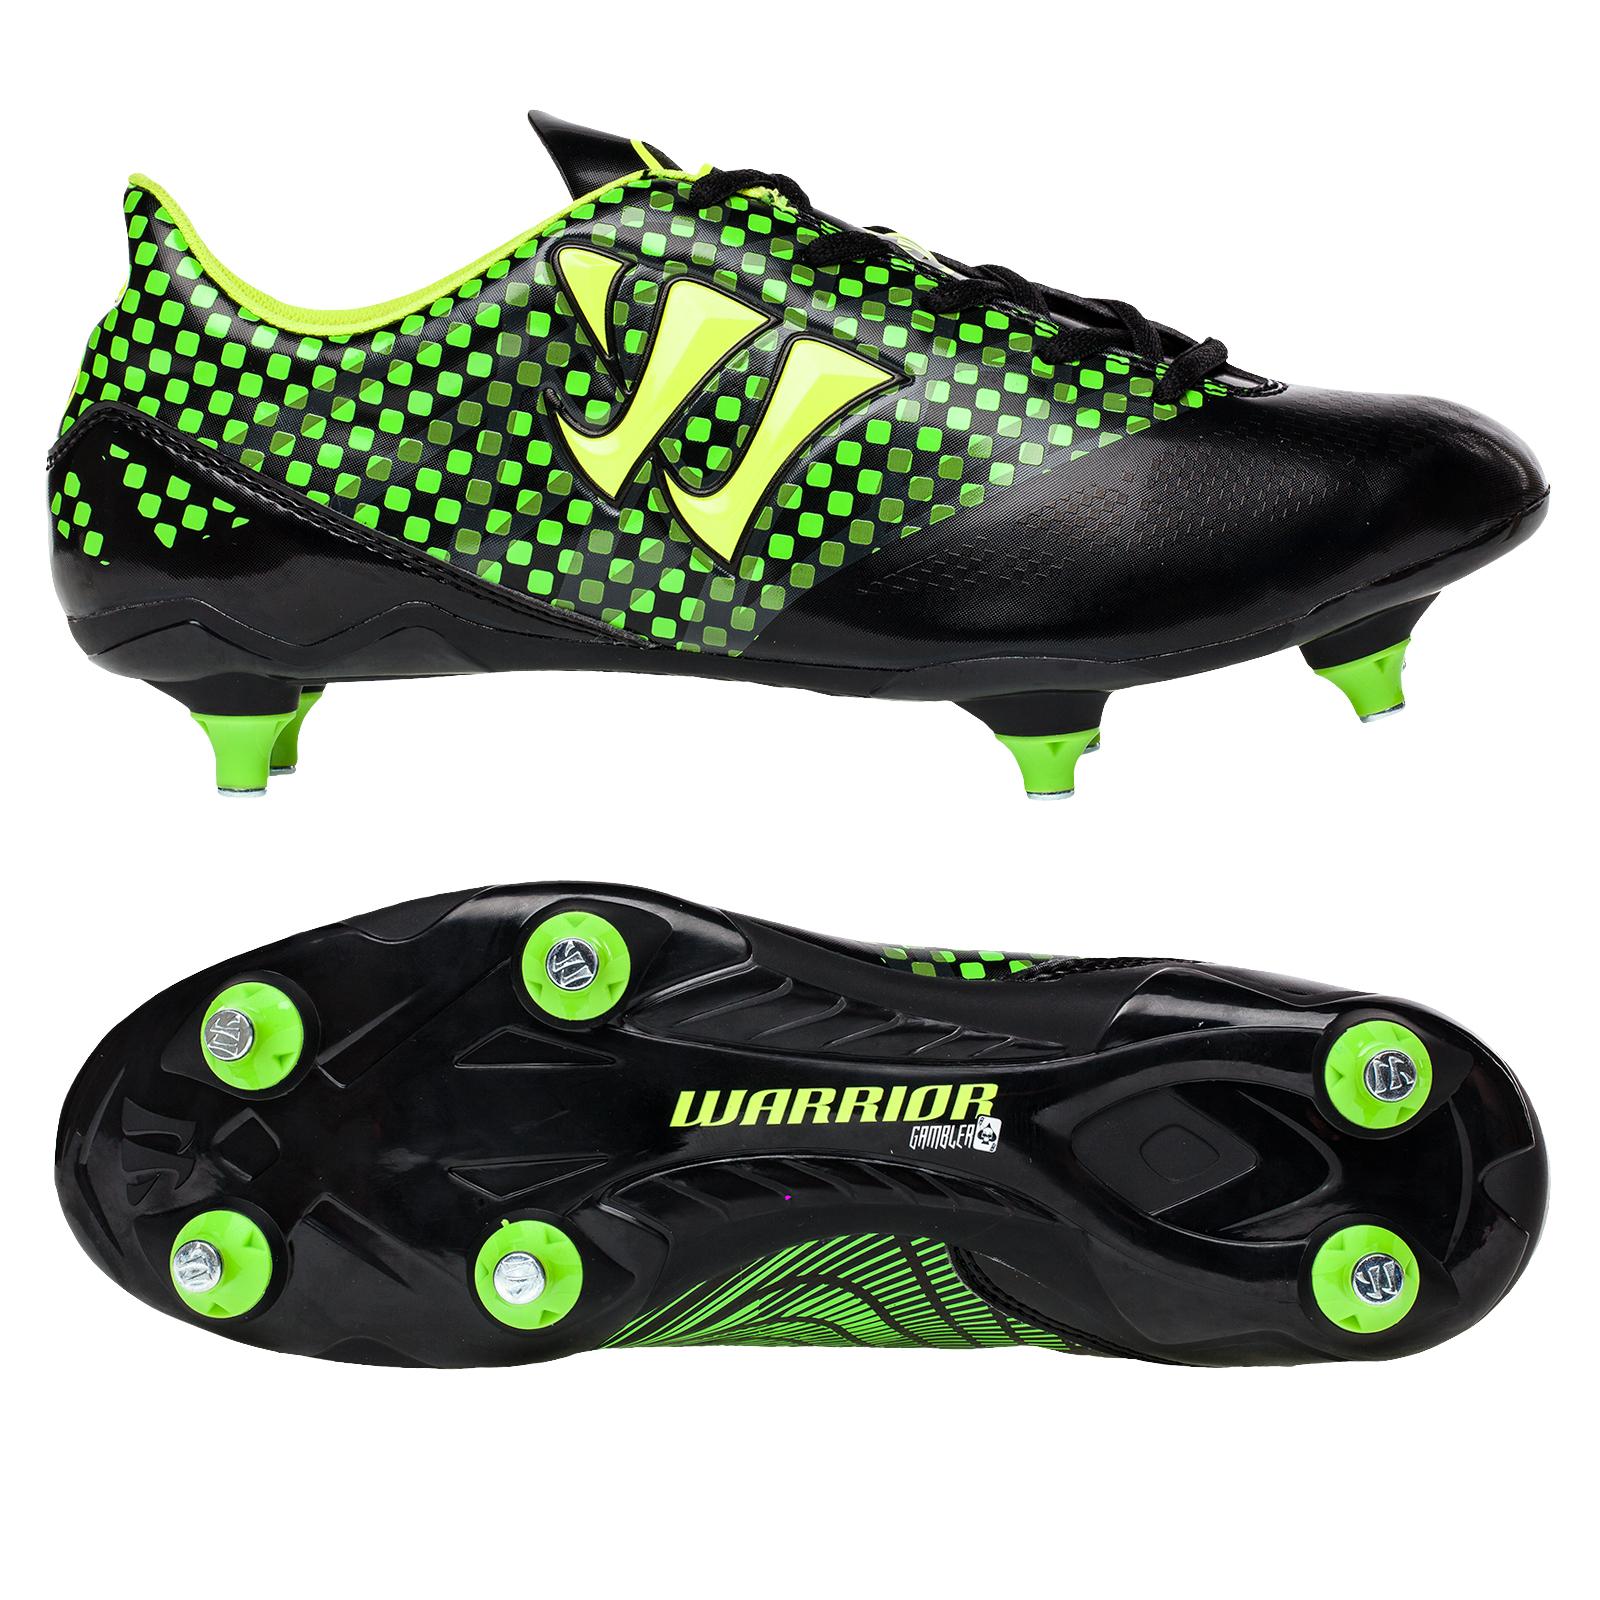 Warrior Sports Gambler Combat Soft Ground Football Boots- Blk/Grn Black